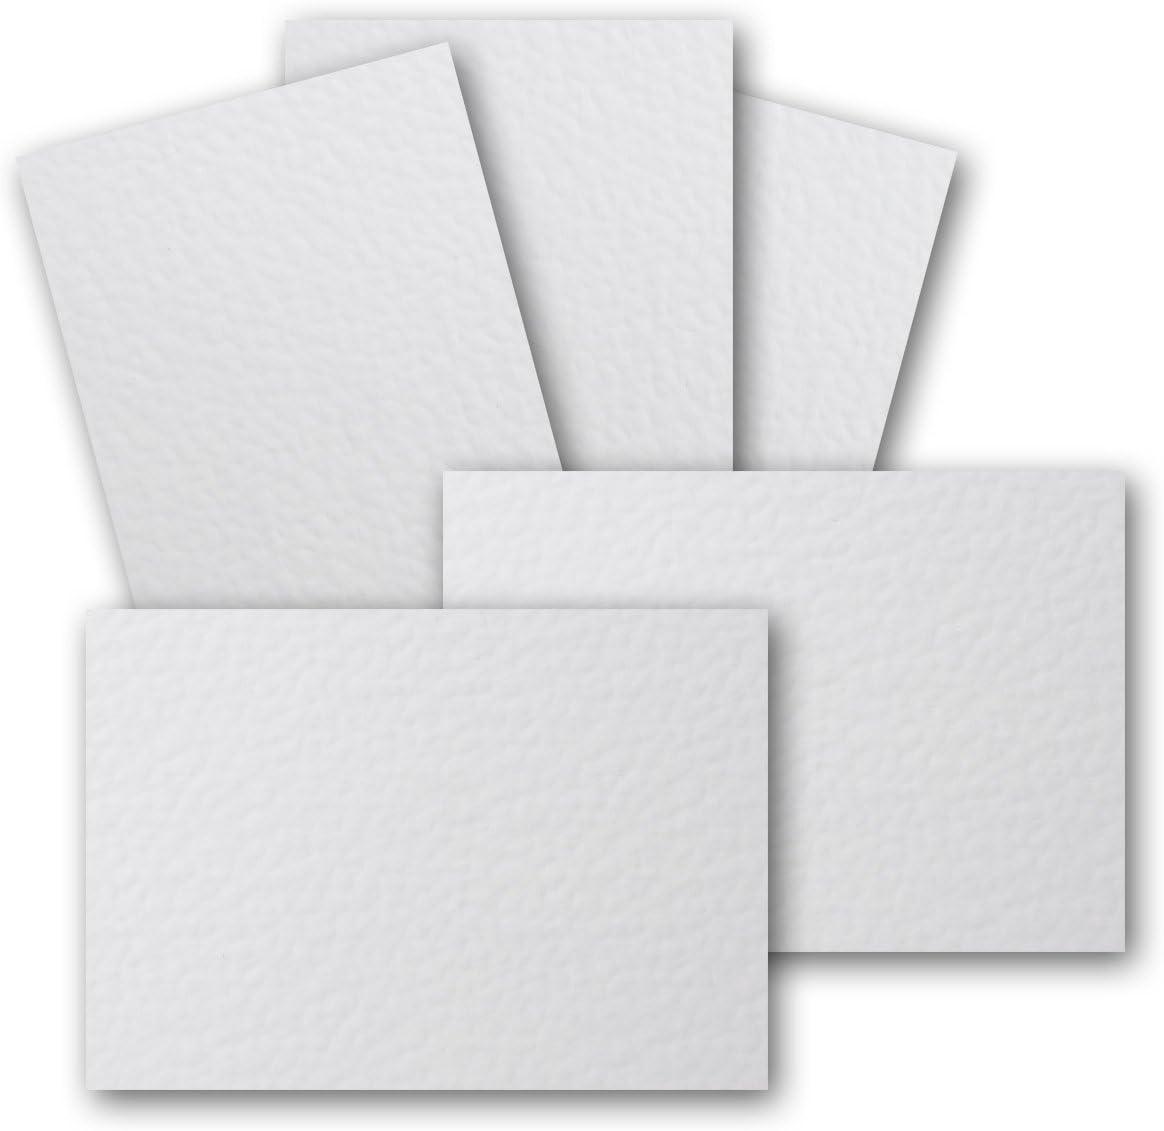 50 St/ück DIN A6 Karton geh/ämmerte Struktur Ideal zum Basteln Gru/ßkarte Farbe: Weiss 105 x 148 mm Gustav NEUSER Einzelkarte ohne Falz Scrapbooking 250 g//m/²